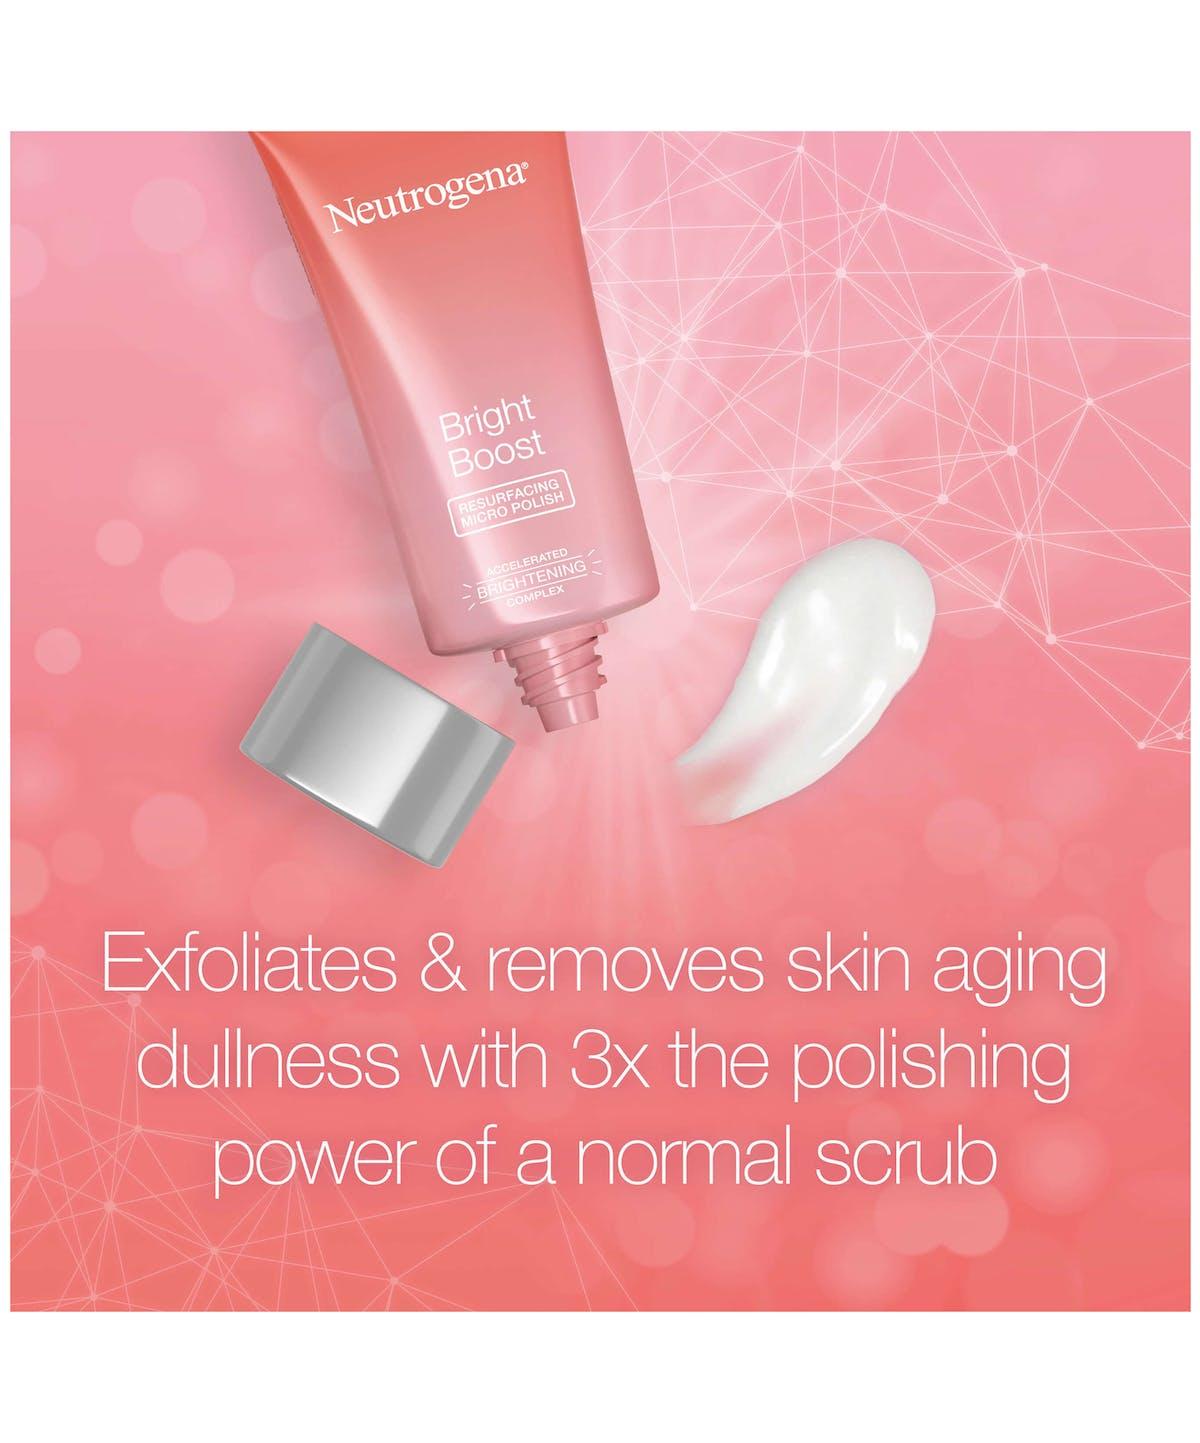 Neutrogena Bright Boost™ Resurfacing Micro Face Polish with Glycolic and  Mandelic AHAs